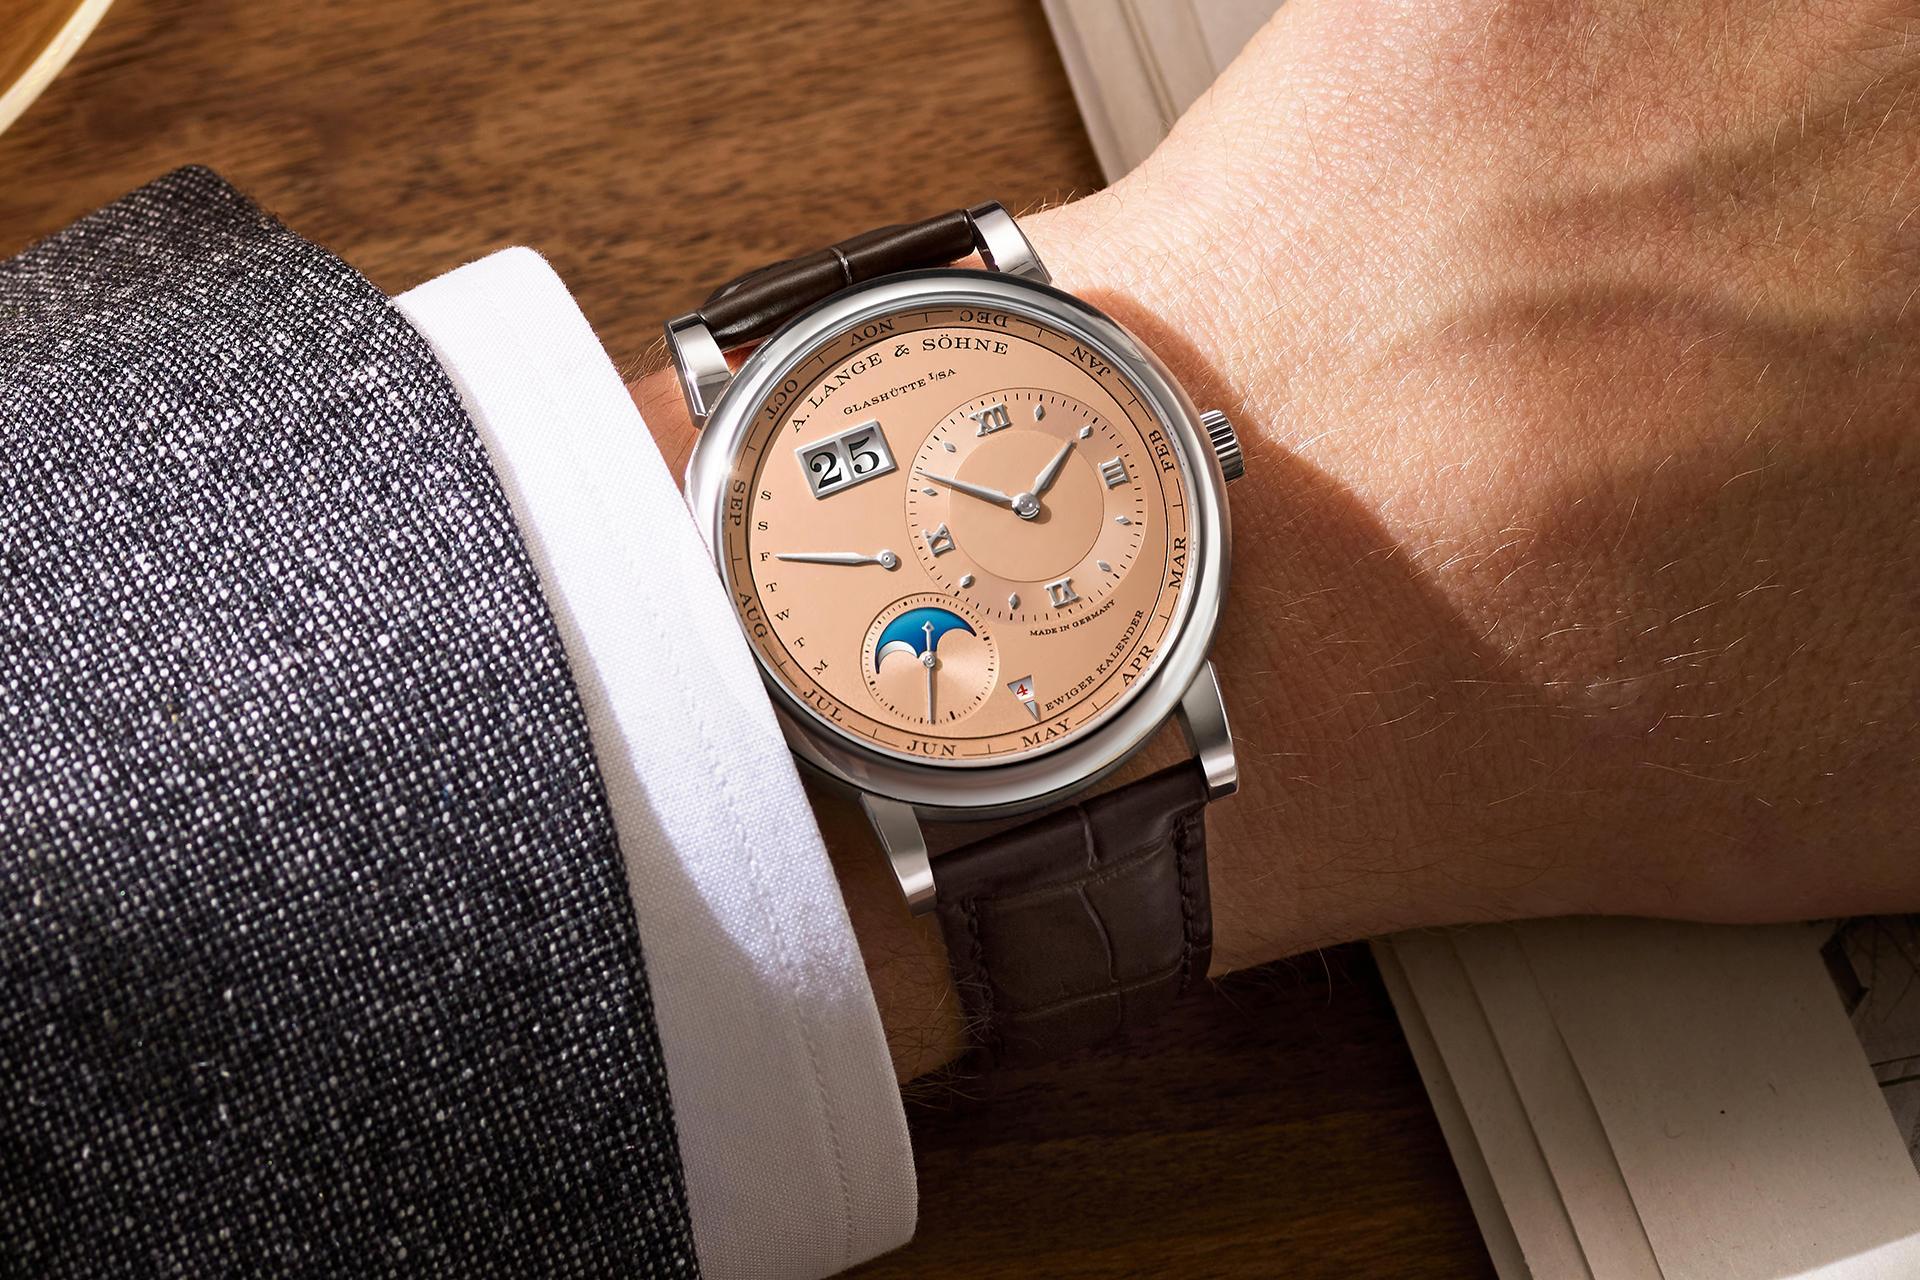 A Lange & Söhne Lange 1 Perpetual Calendar watch 2021